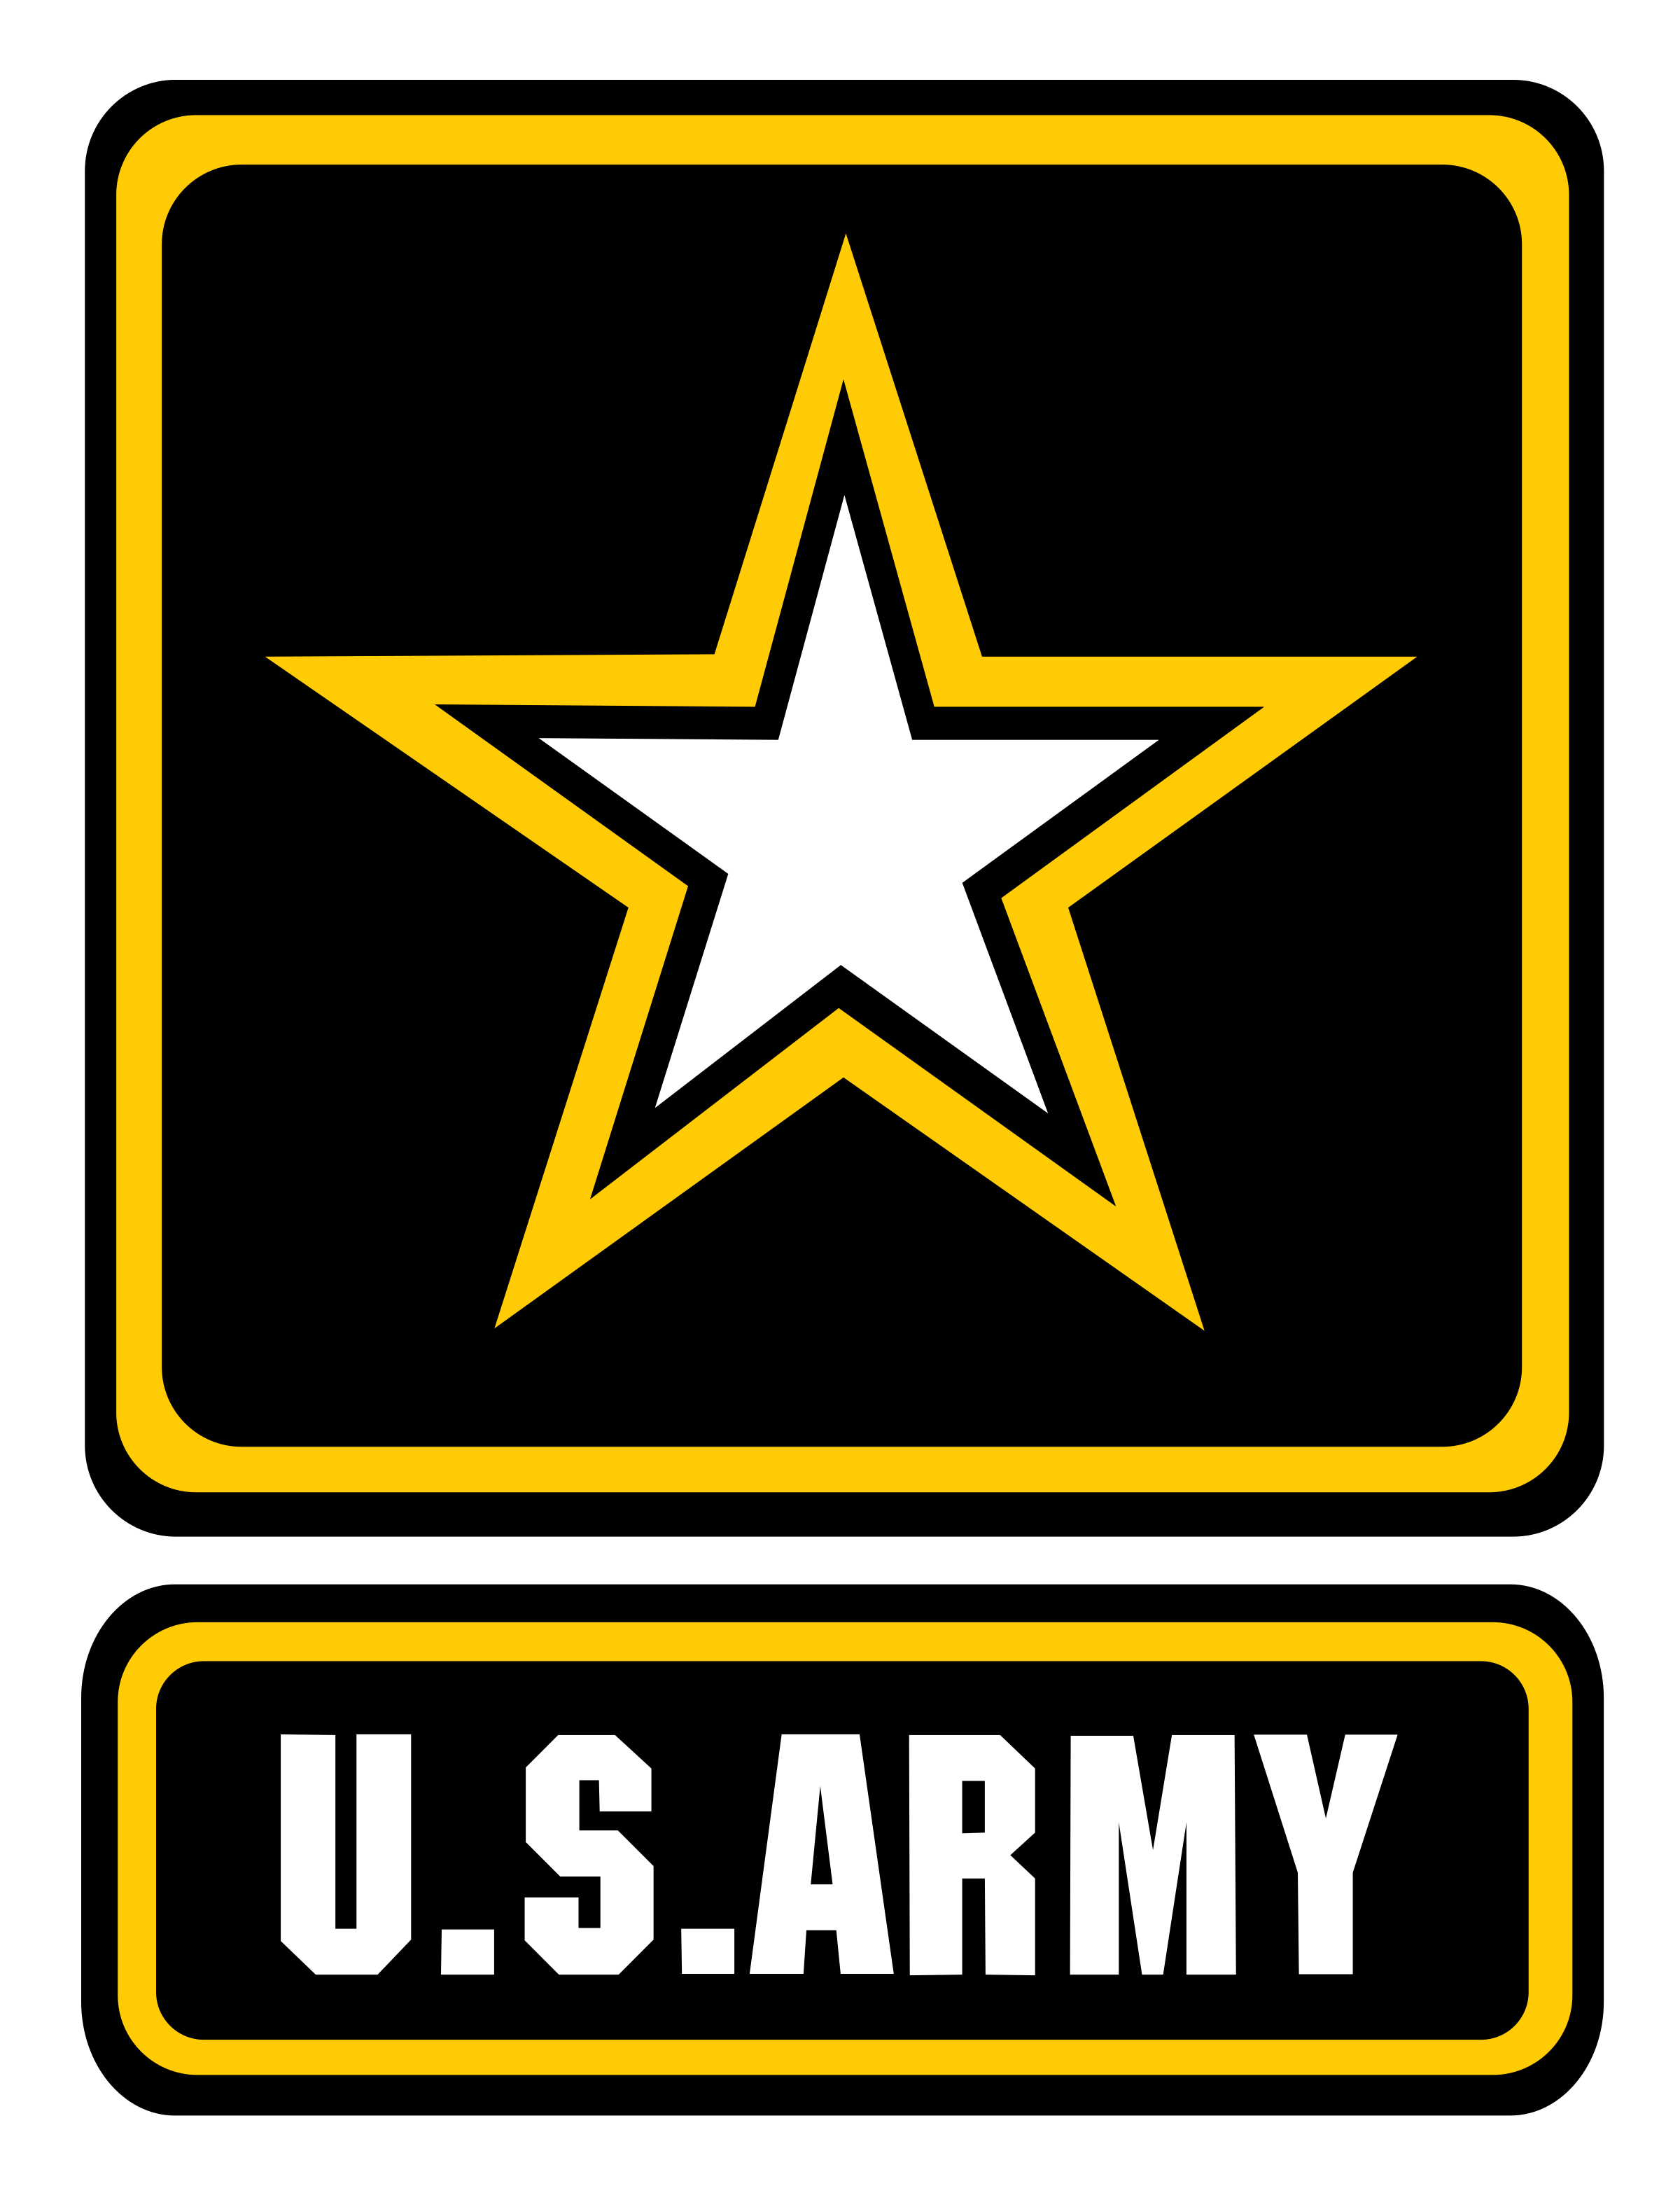 U.S. Army Logo PNG Transparent & SVG Vector.